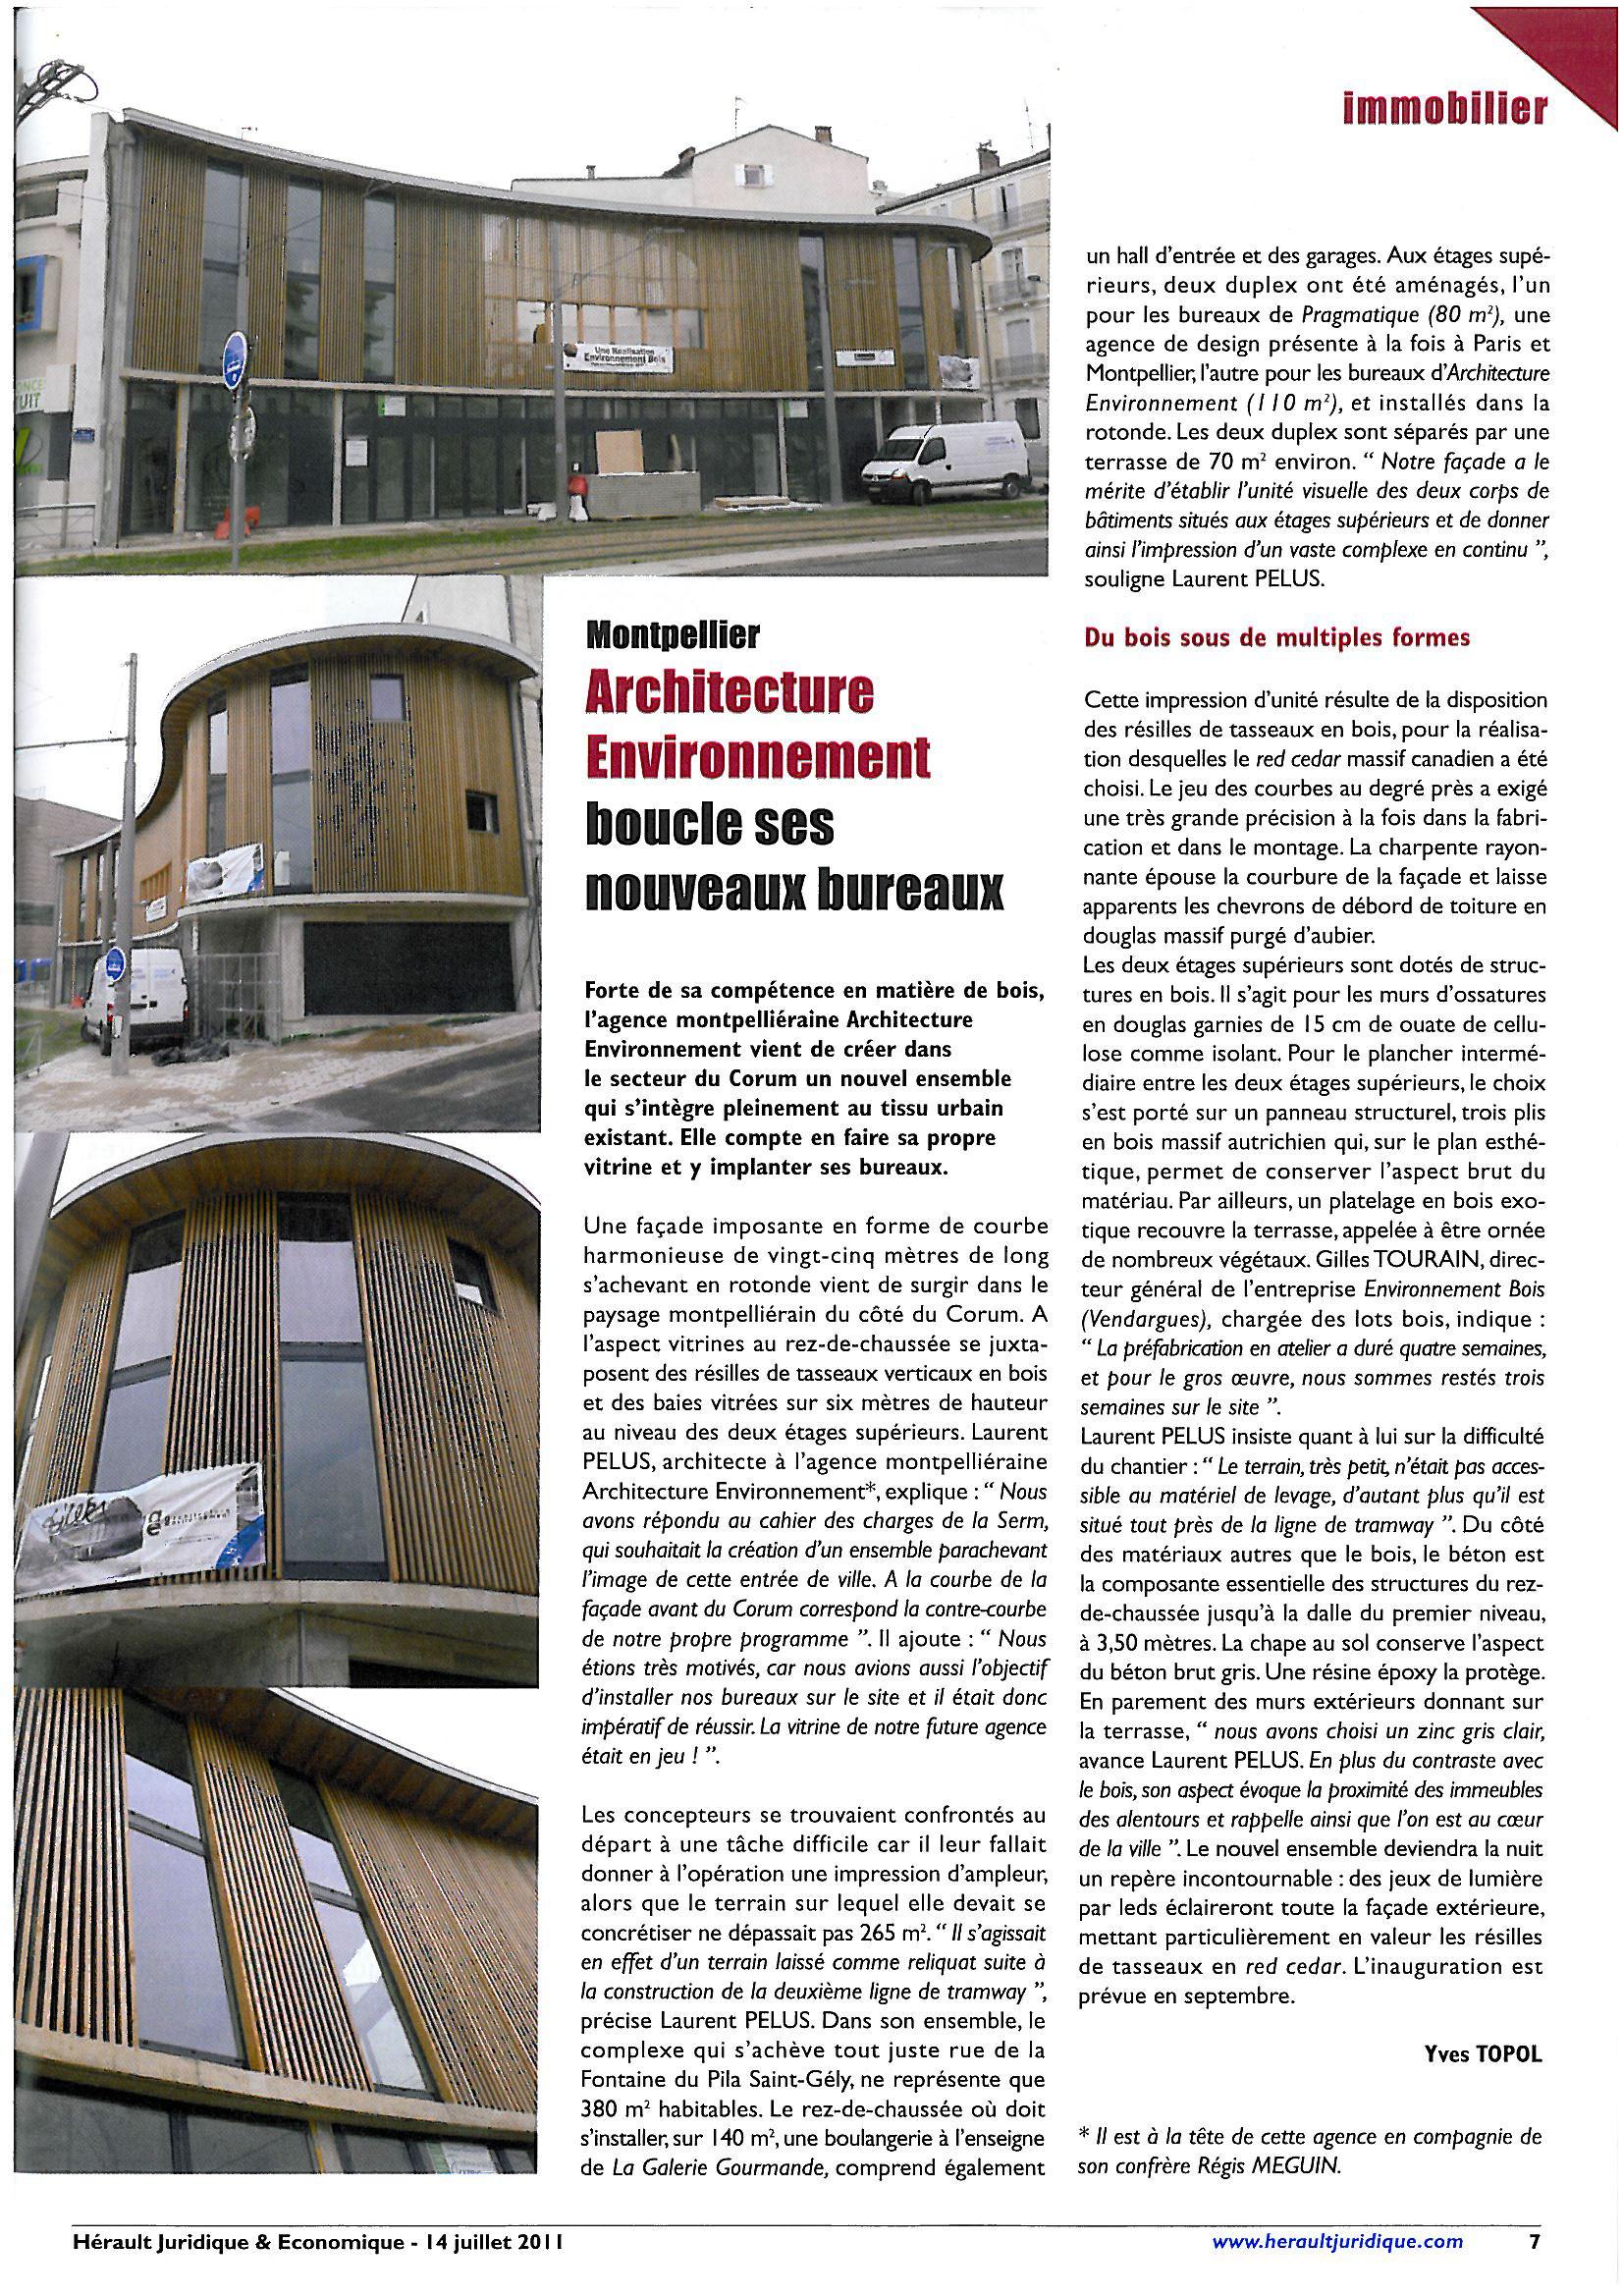 herault-juridique-et-economique-14-07-2011